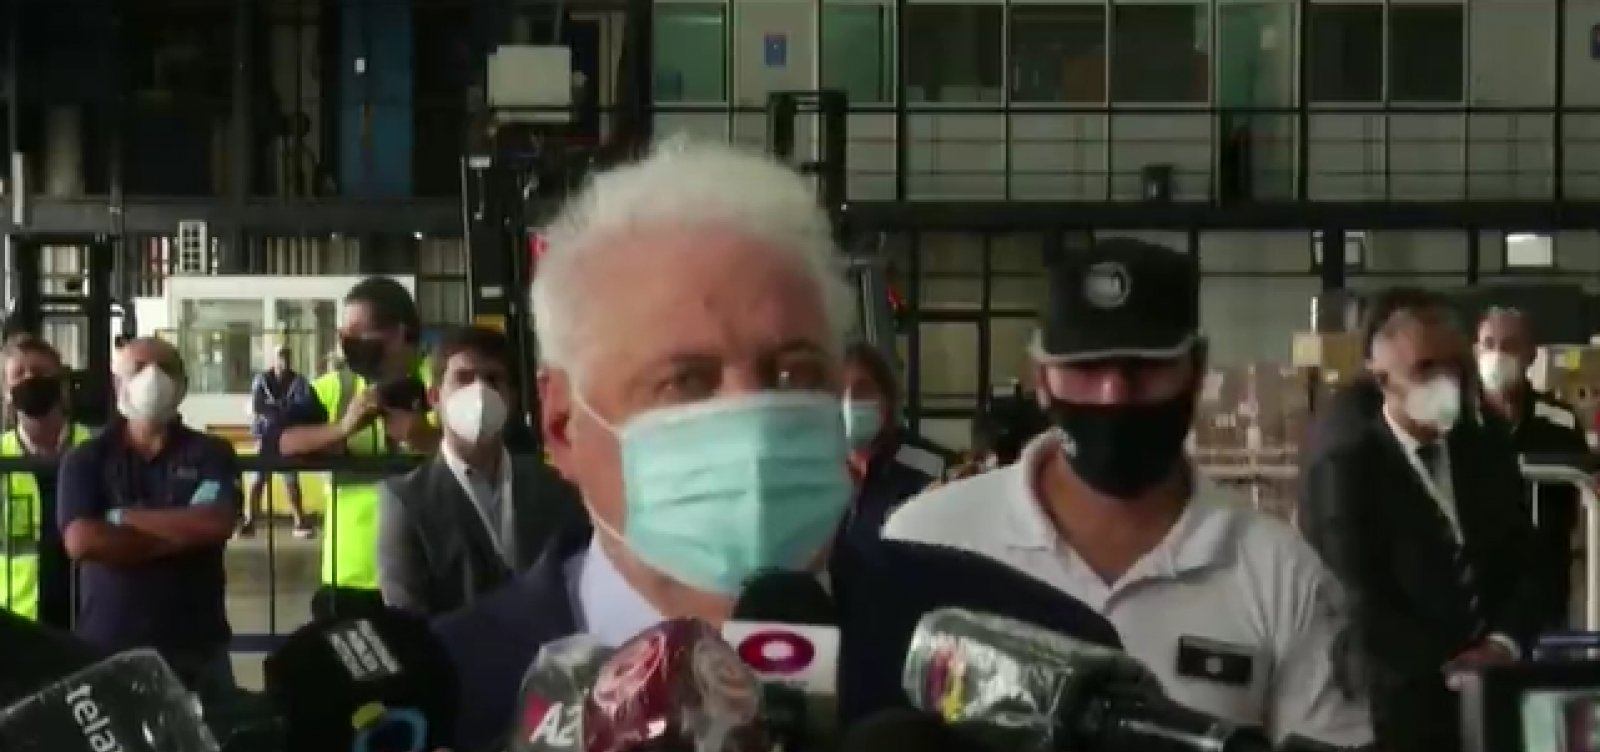 [Ministro da Saúde argentino renuncia após escândalo com desvio de vacinas]